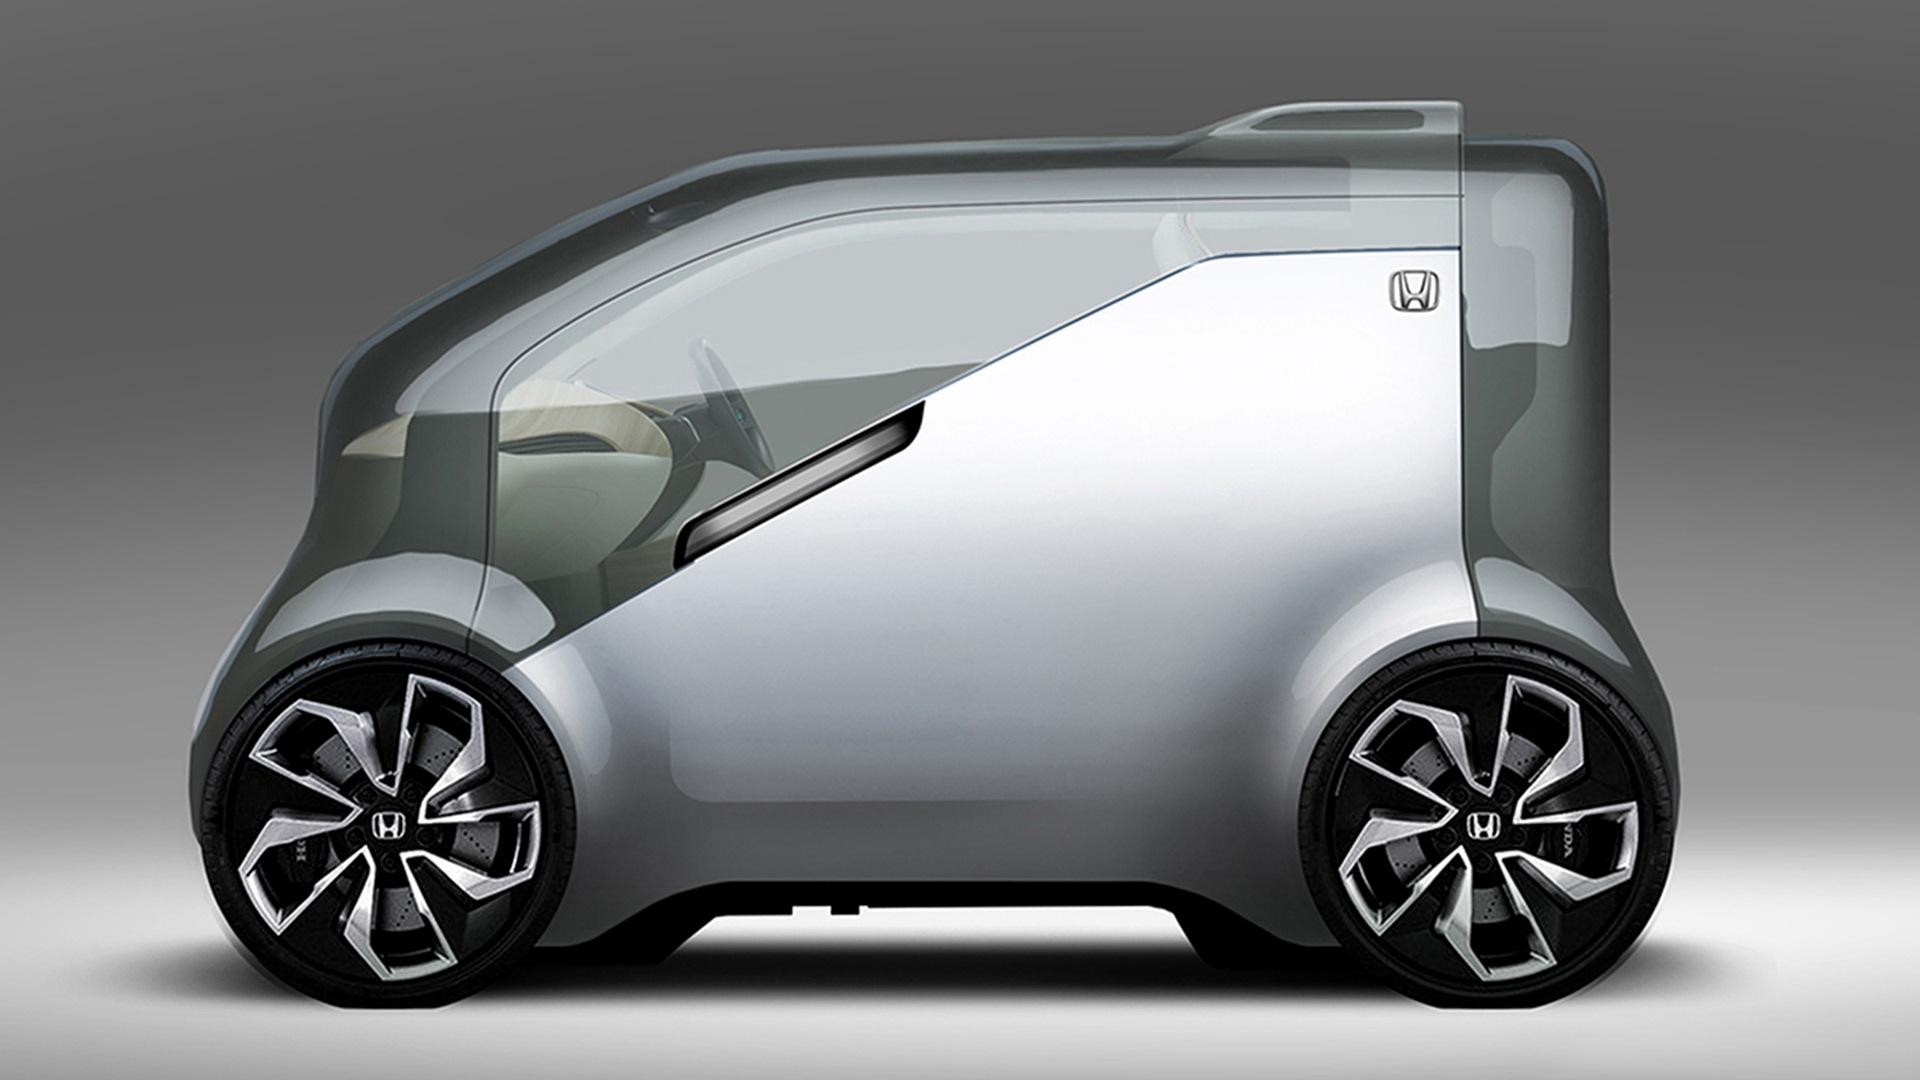 Honda NeuV concept, 2017 Consumer Electronics Show